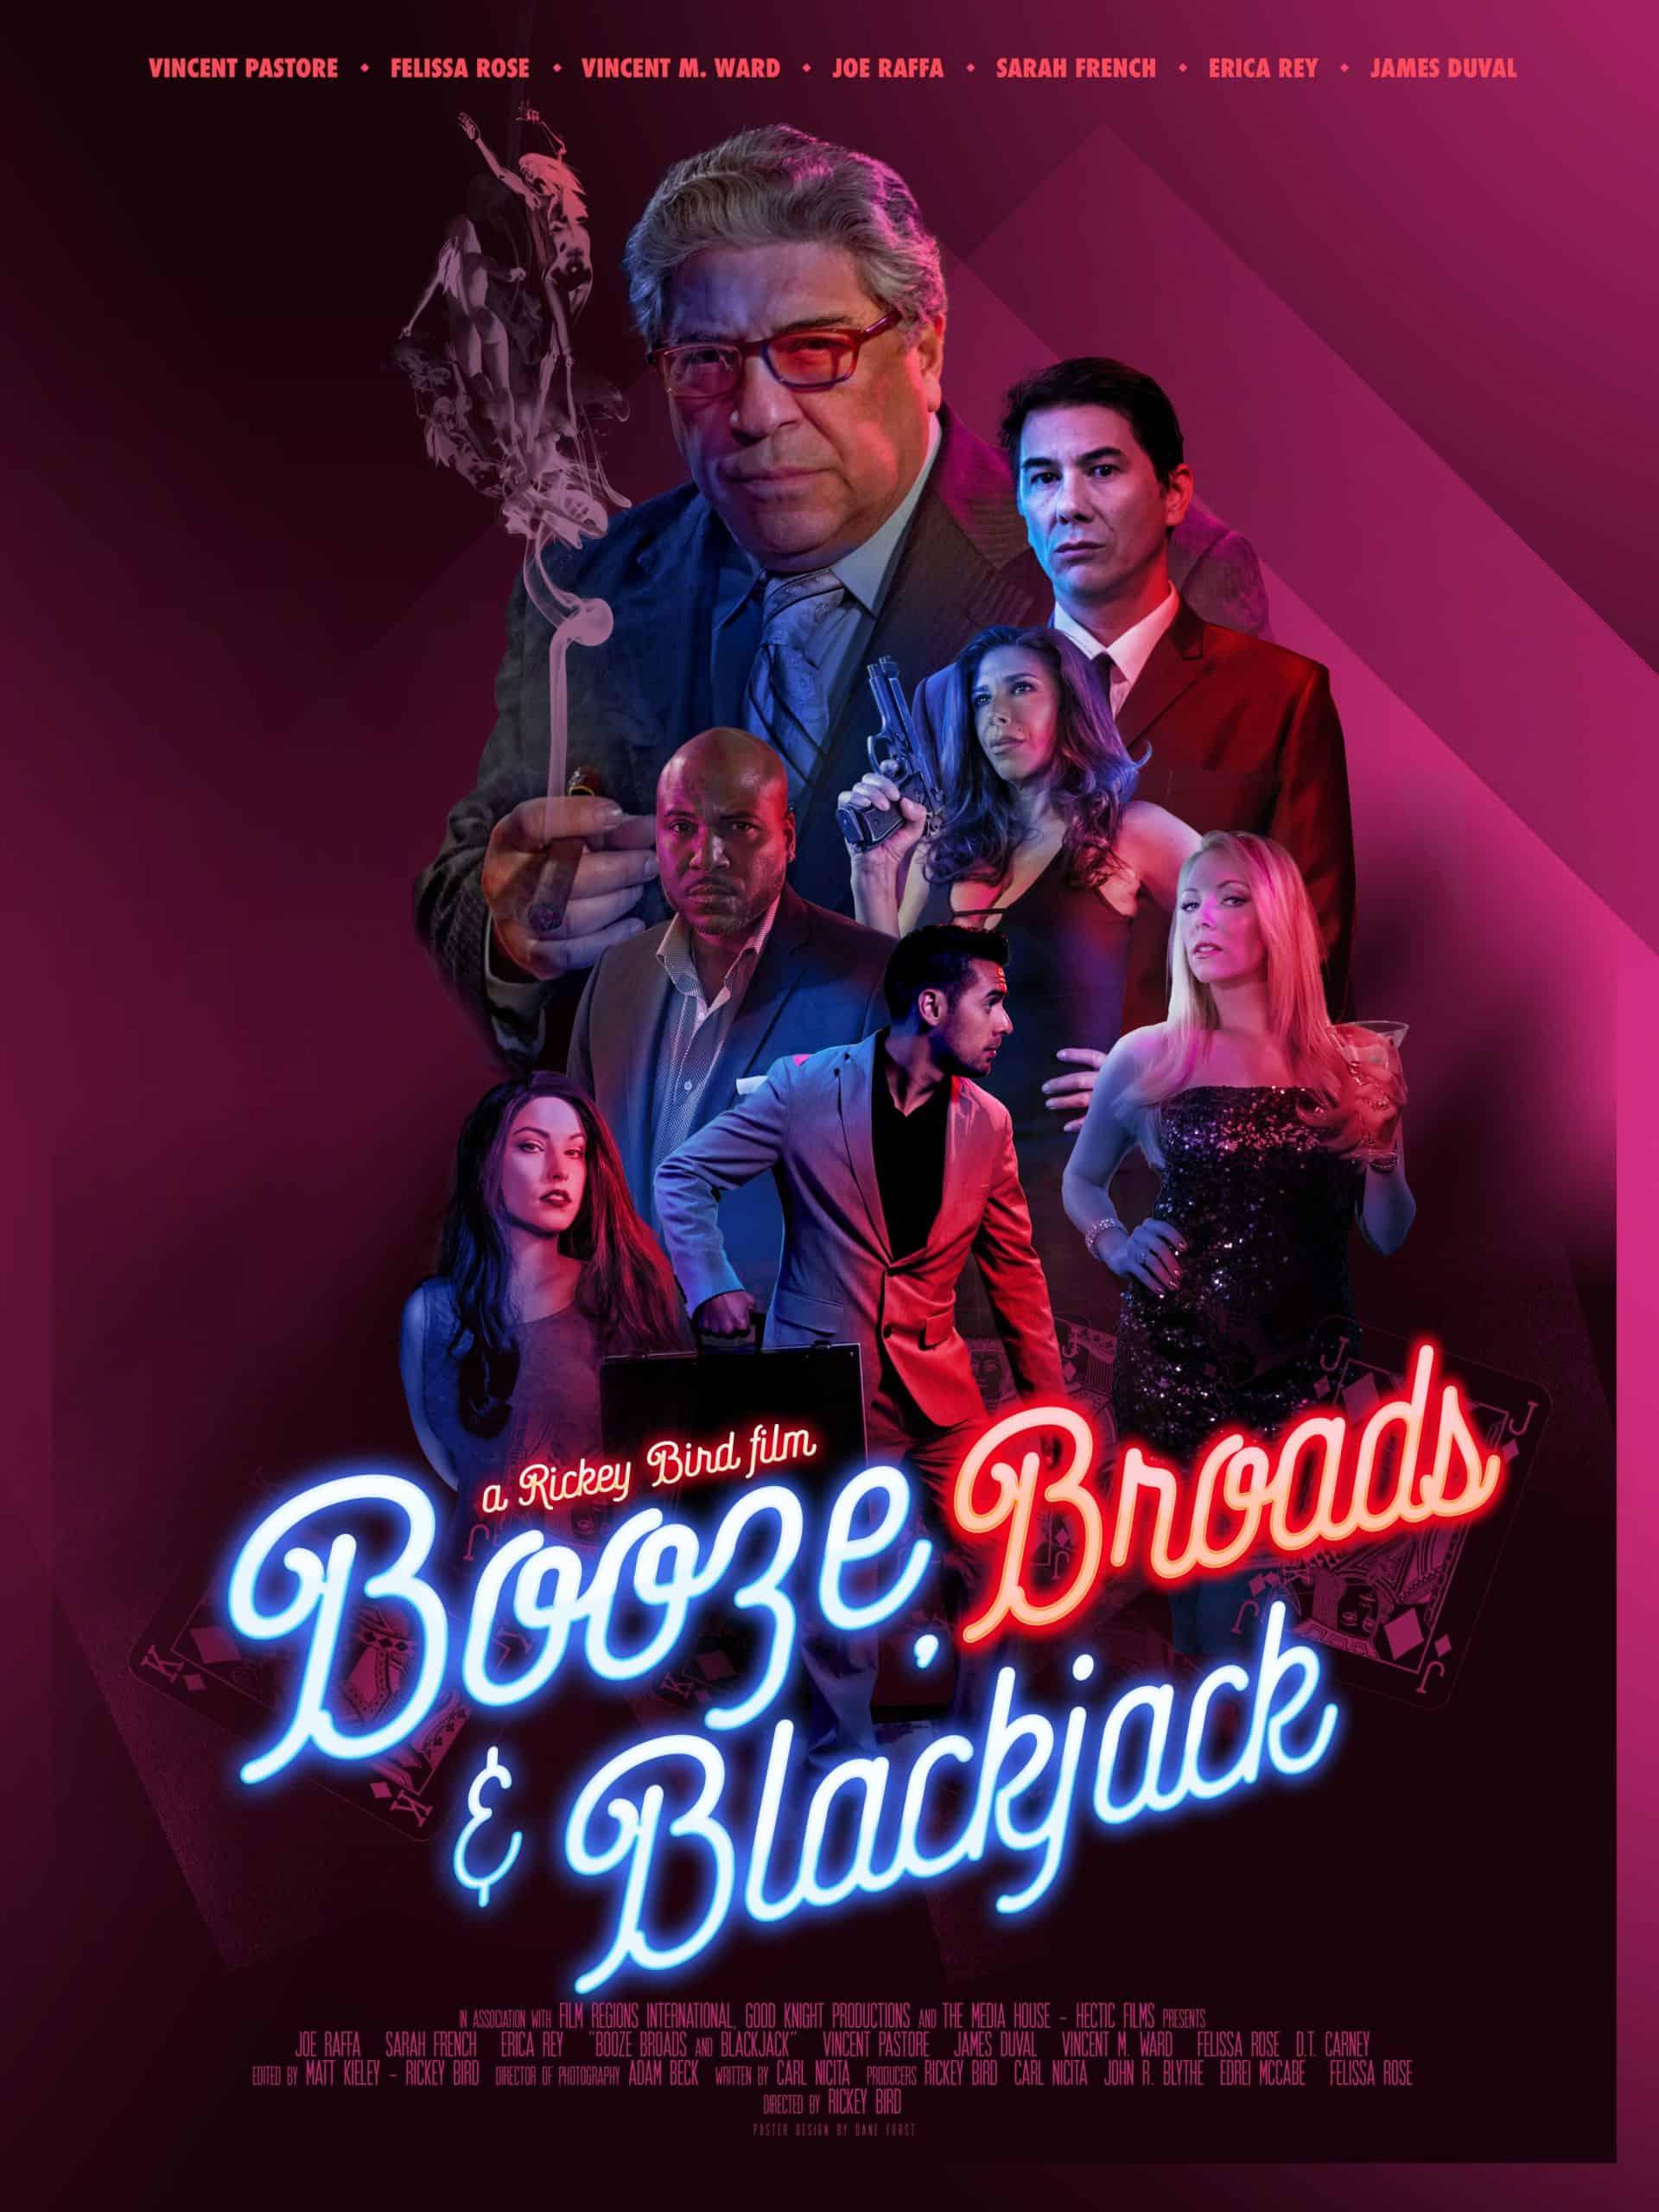 Booze Broads and Blackjack movie poster